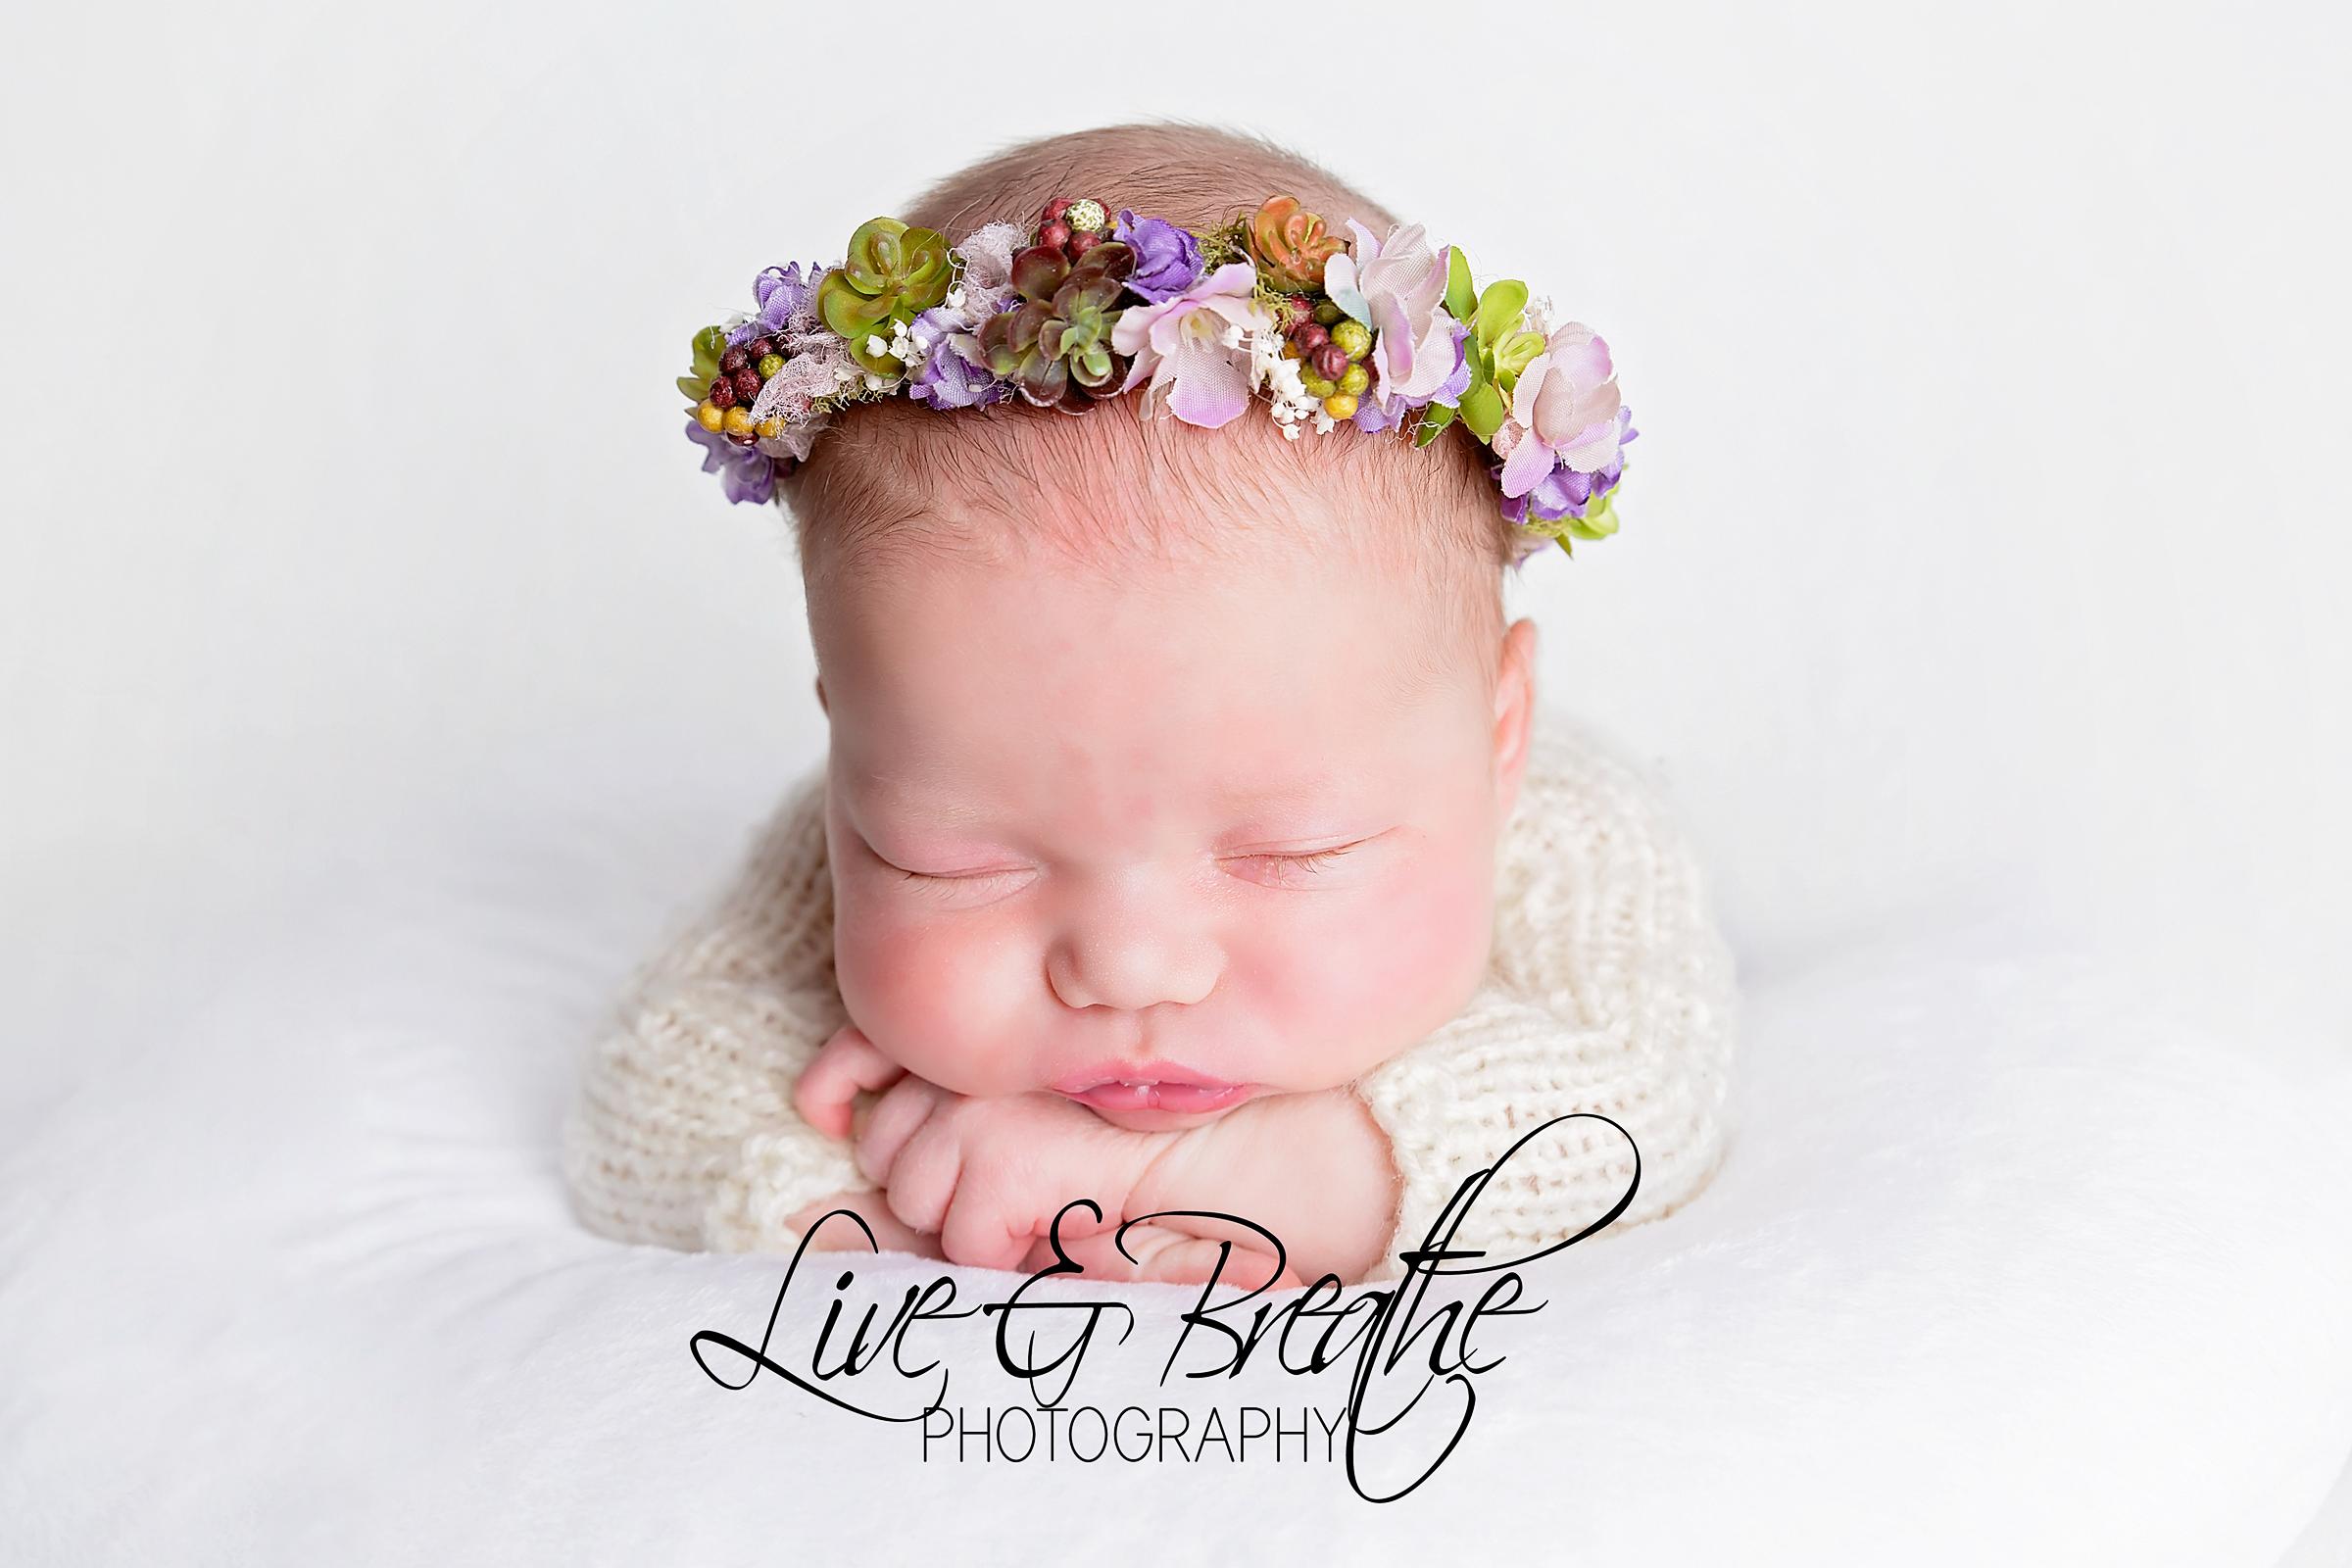 Newborn with halo